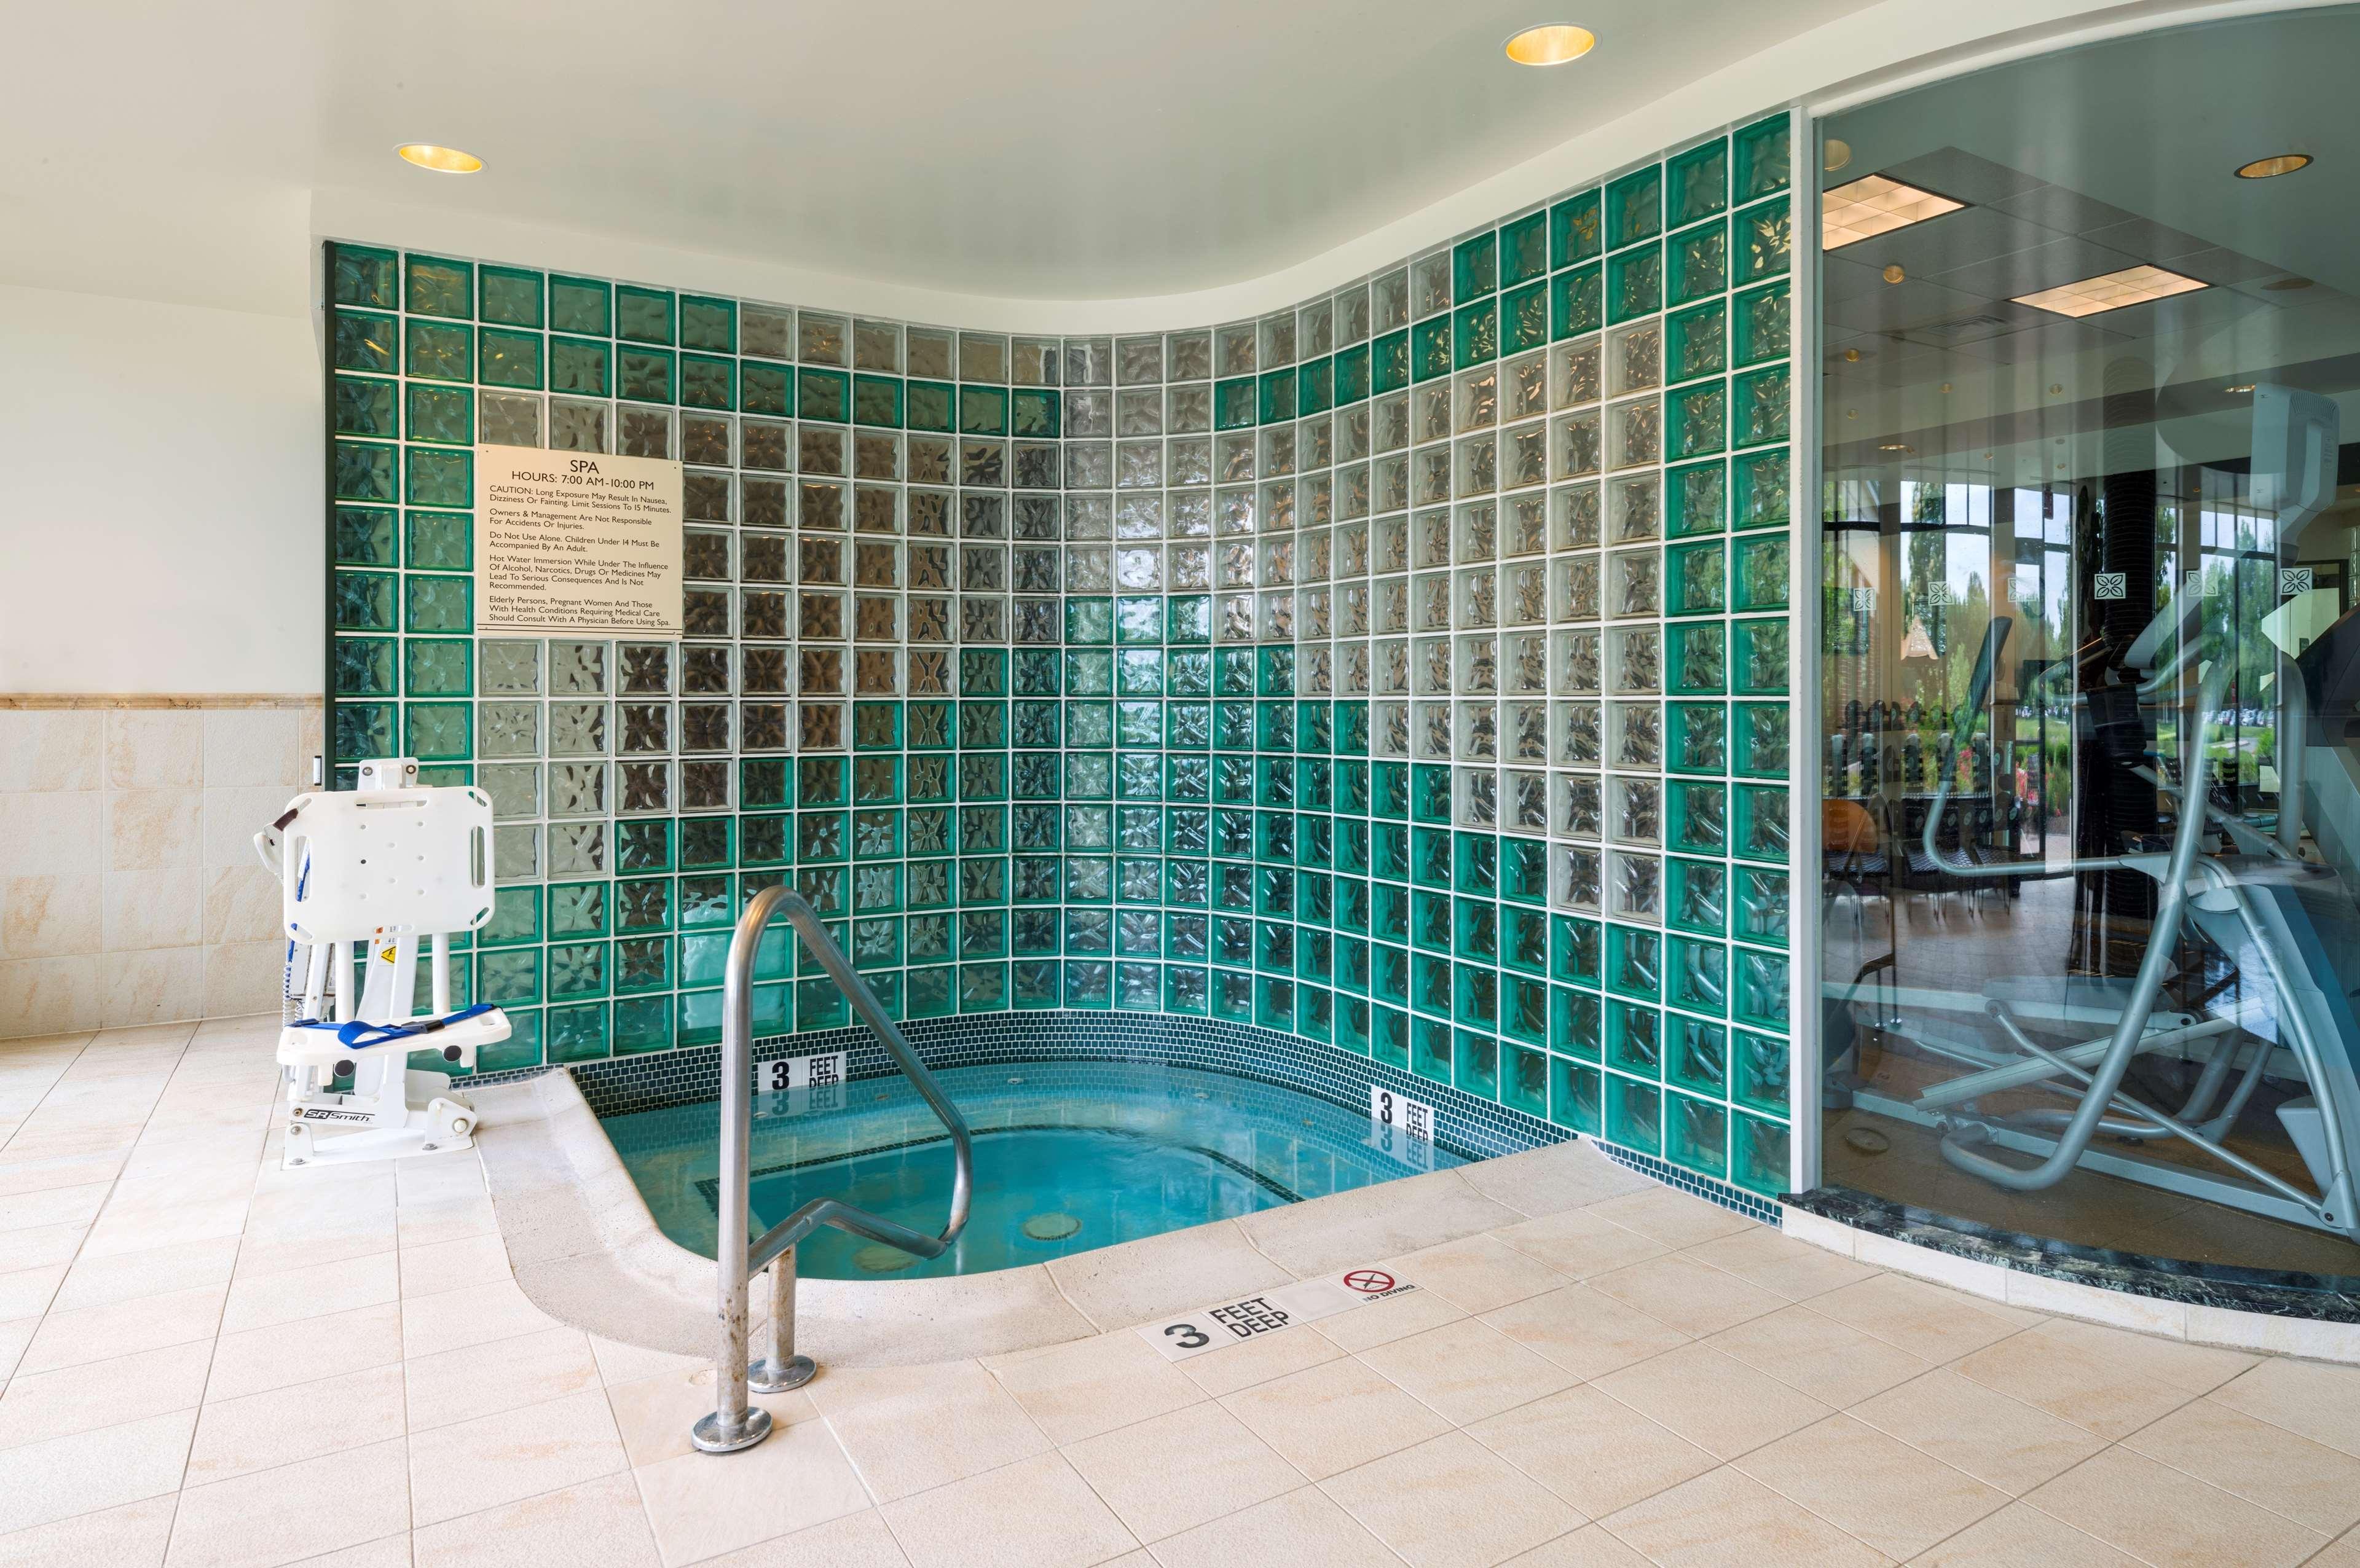 Hilton Garden Inn Hartford South/Glastonbury image 10